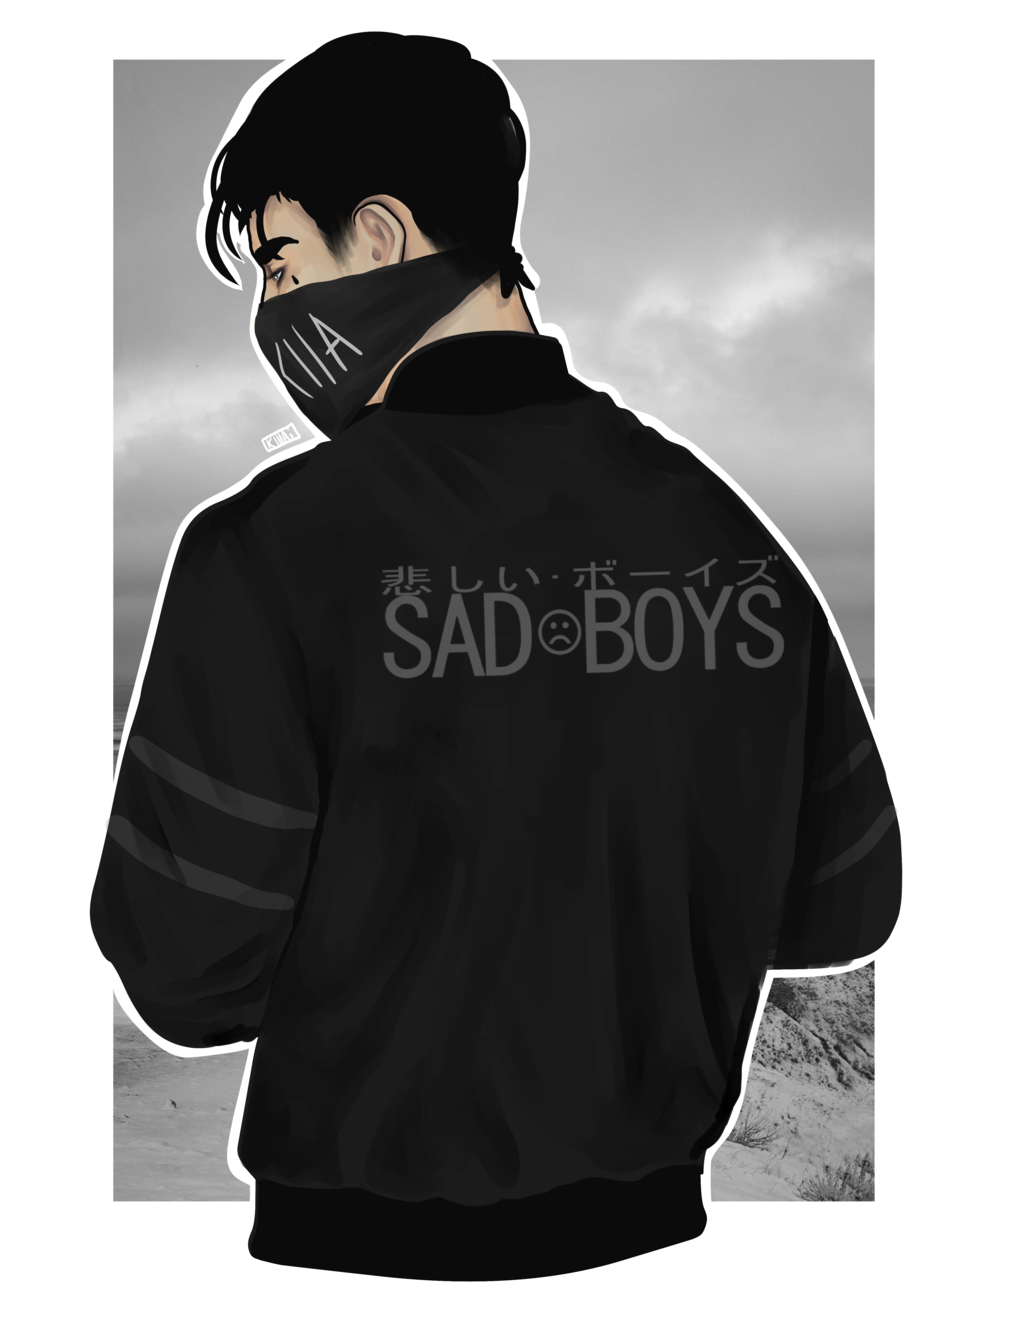 . PlusPng.com Sad Boy Squad by Killer-Instincts - PNG Sad Boy